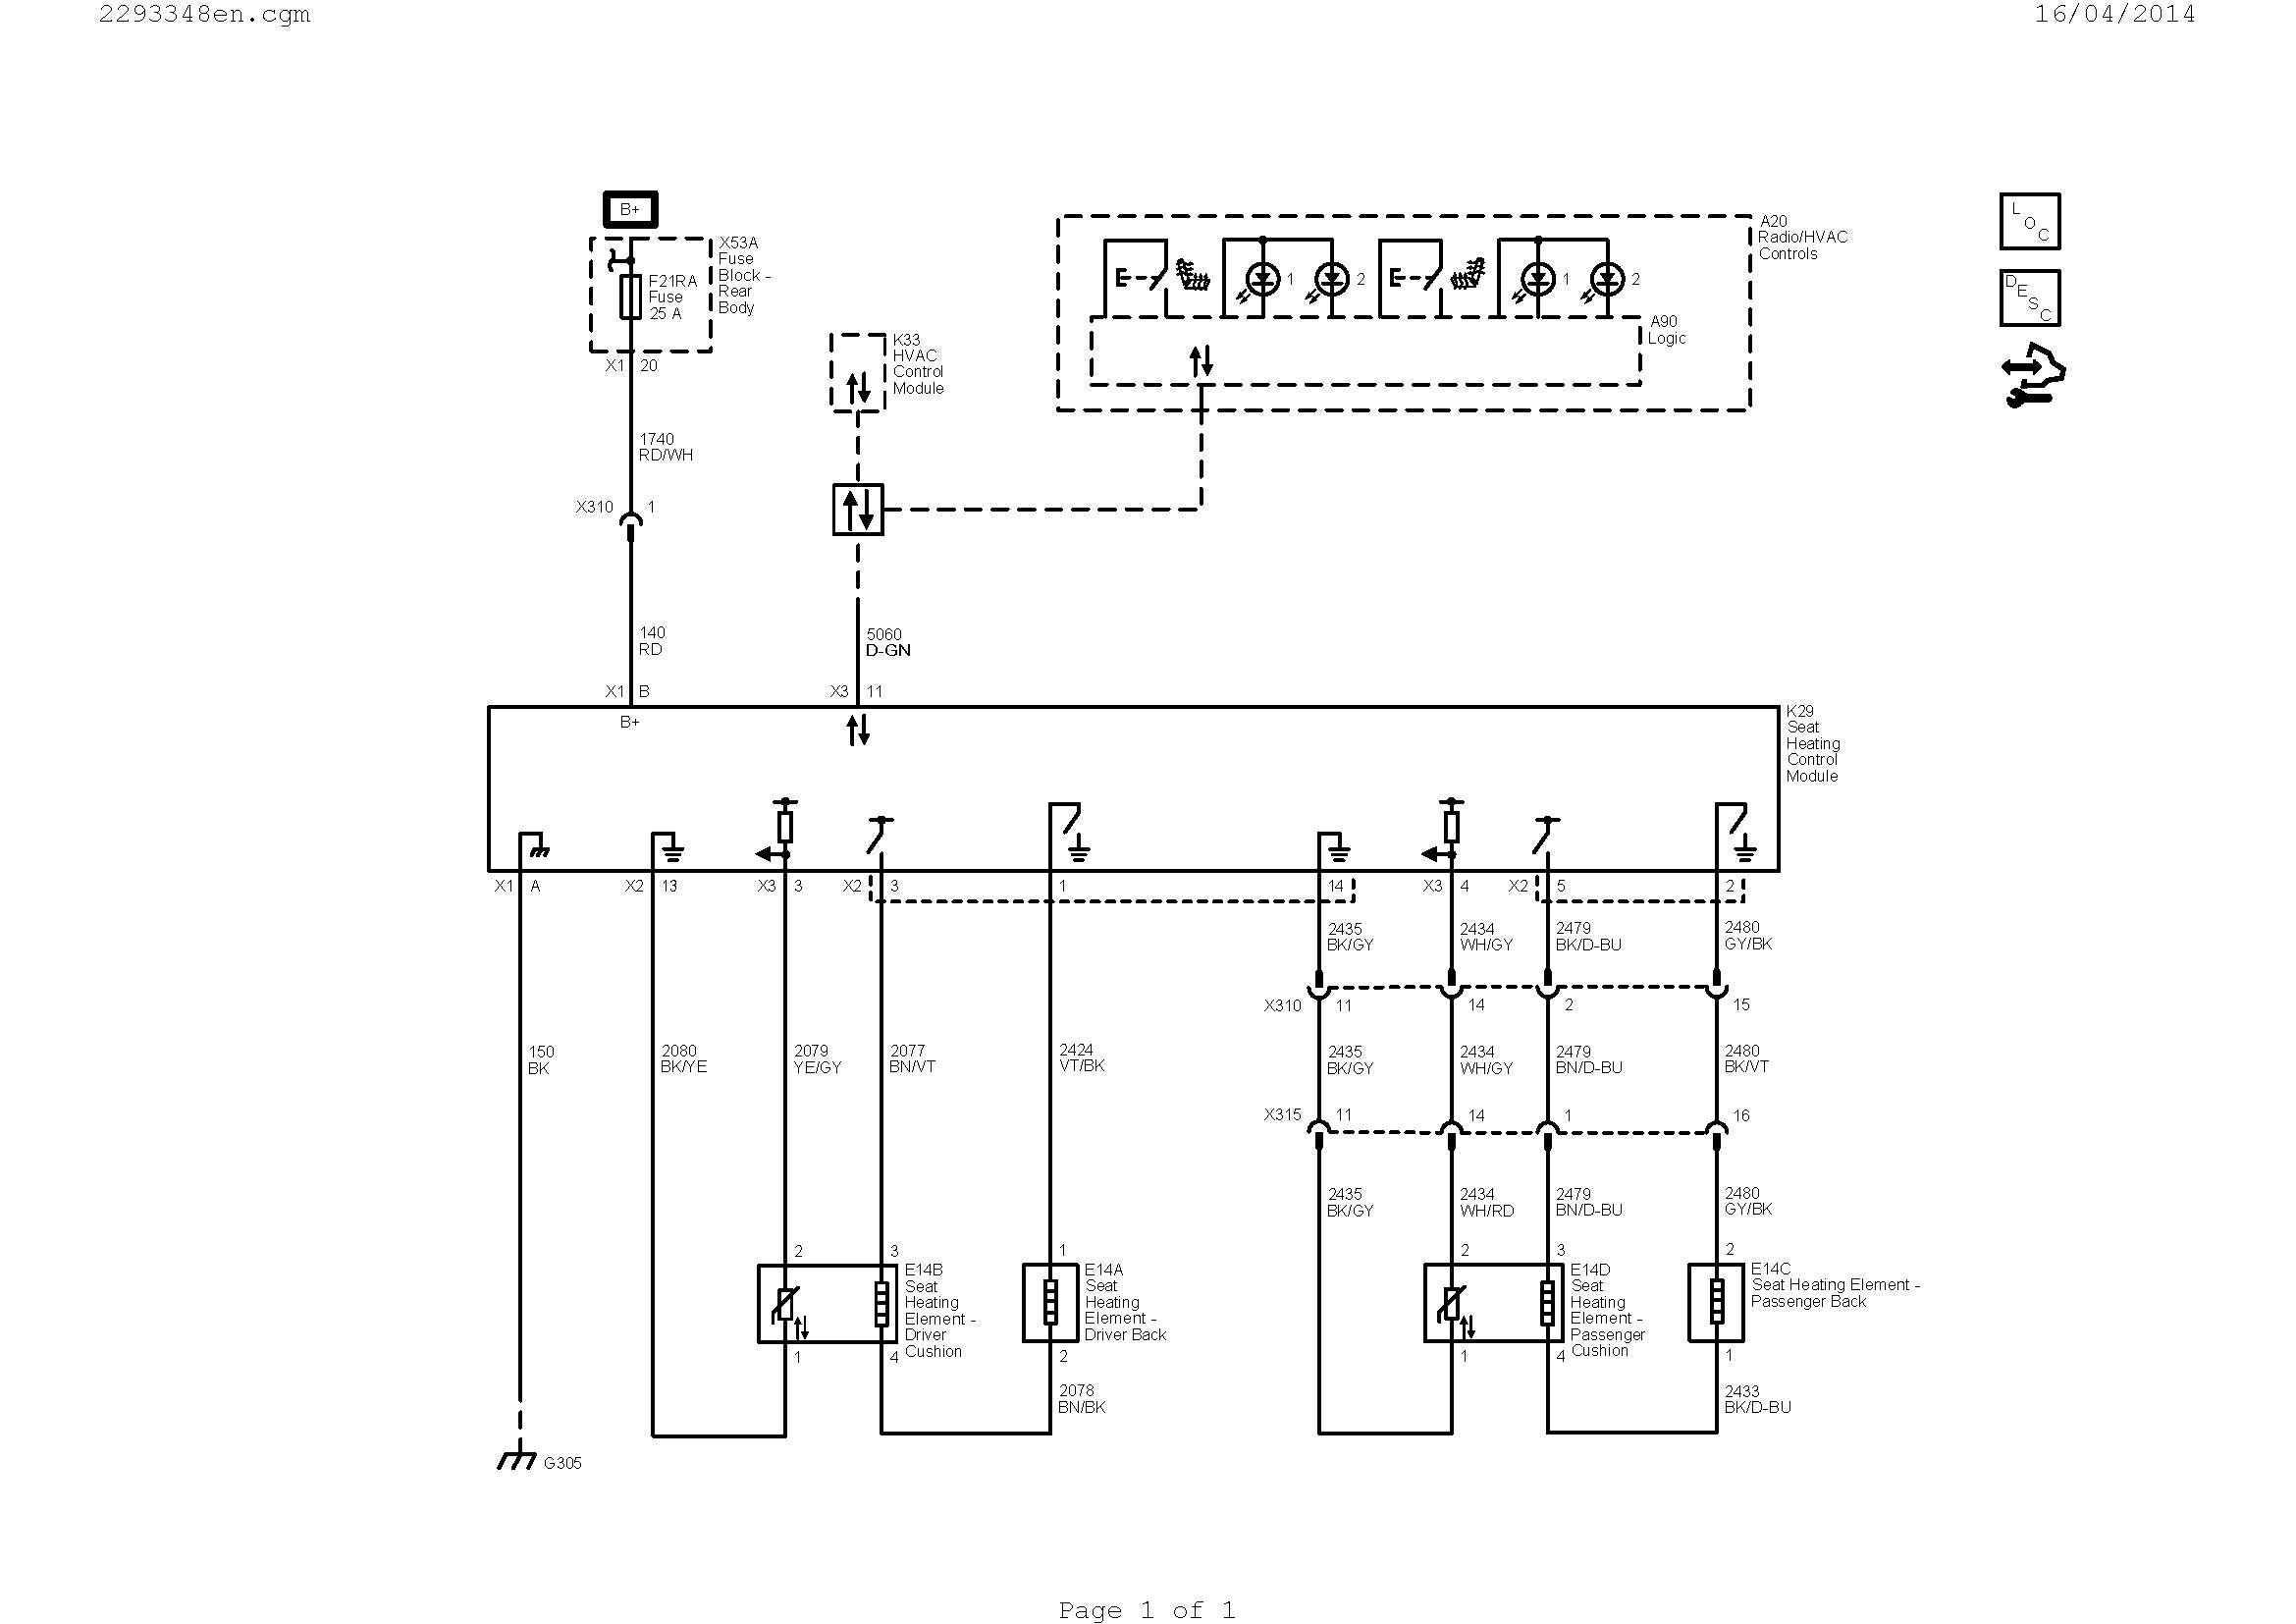 Car Audio Diagrams and Charts Kenwood Wiring Diagram Of Car Audio Diagrams and Charts